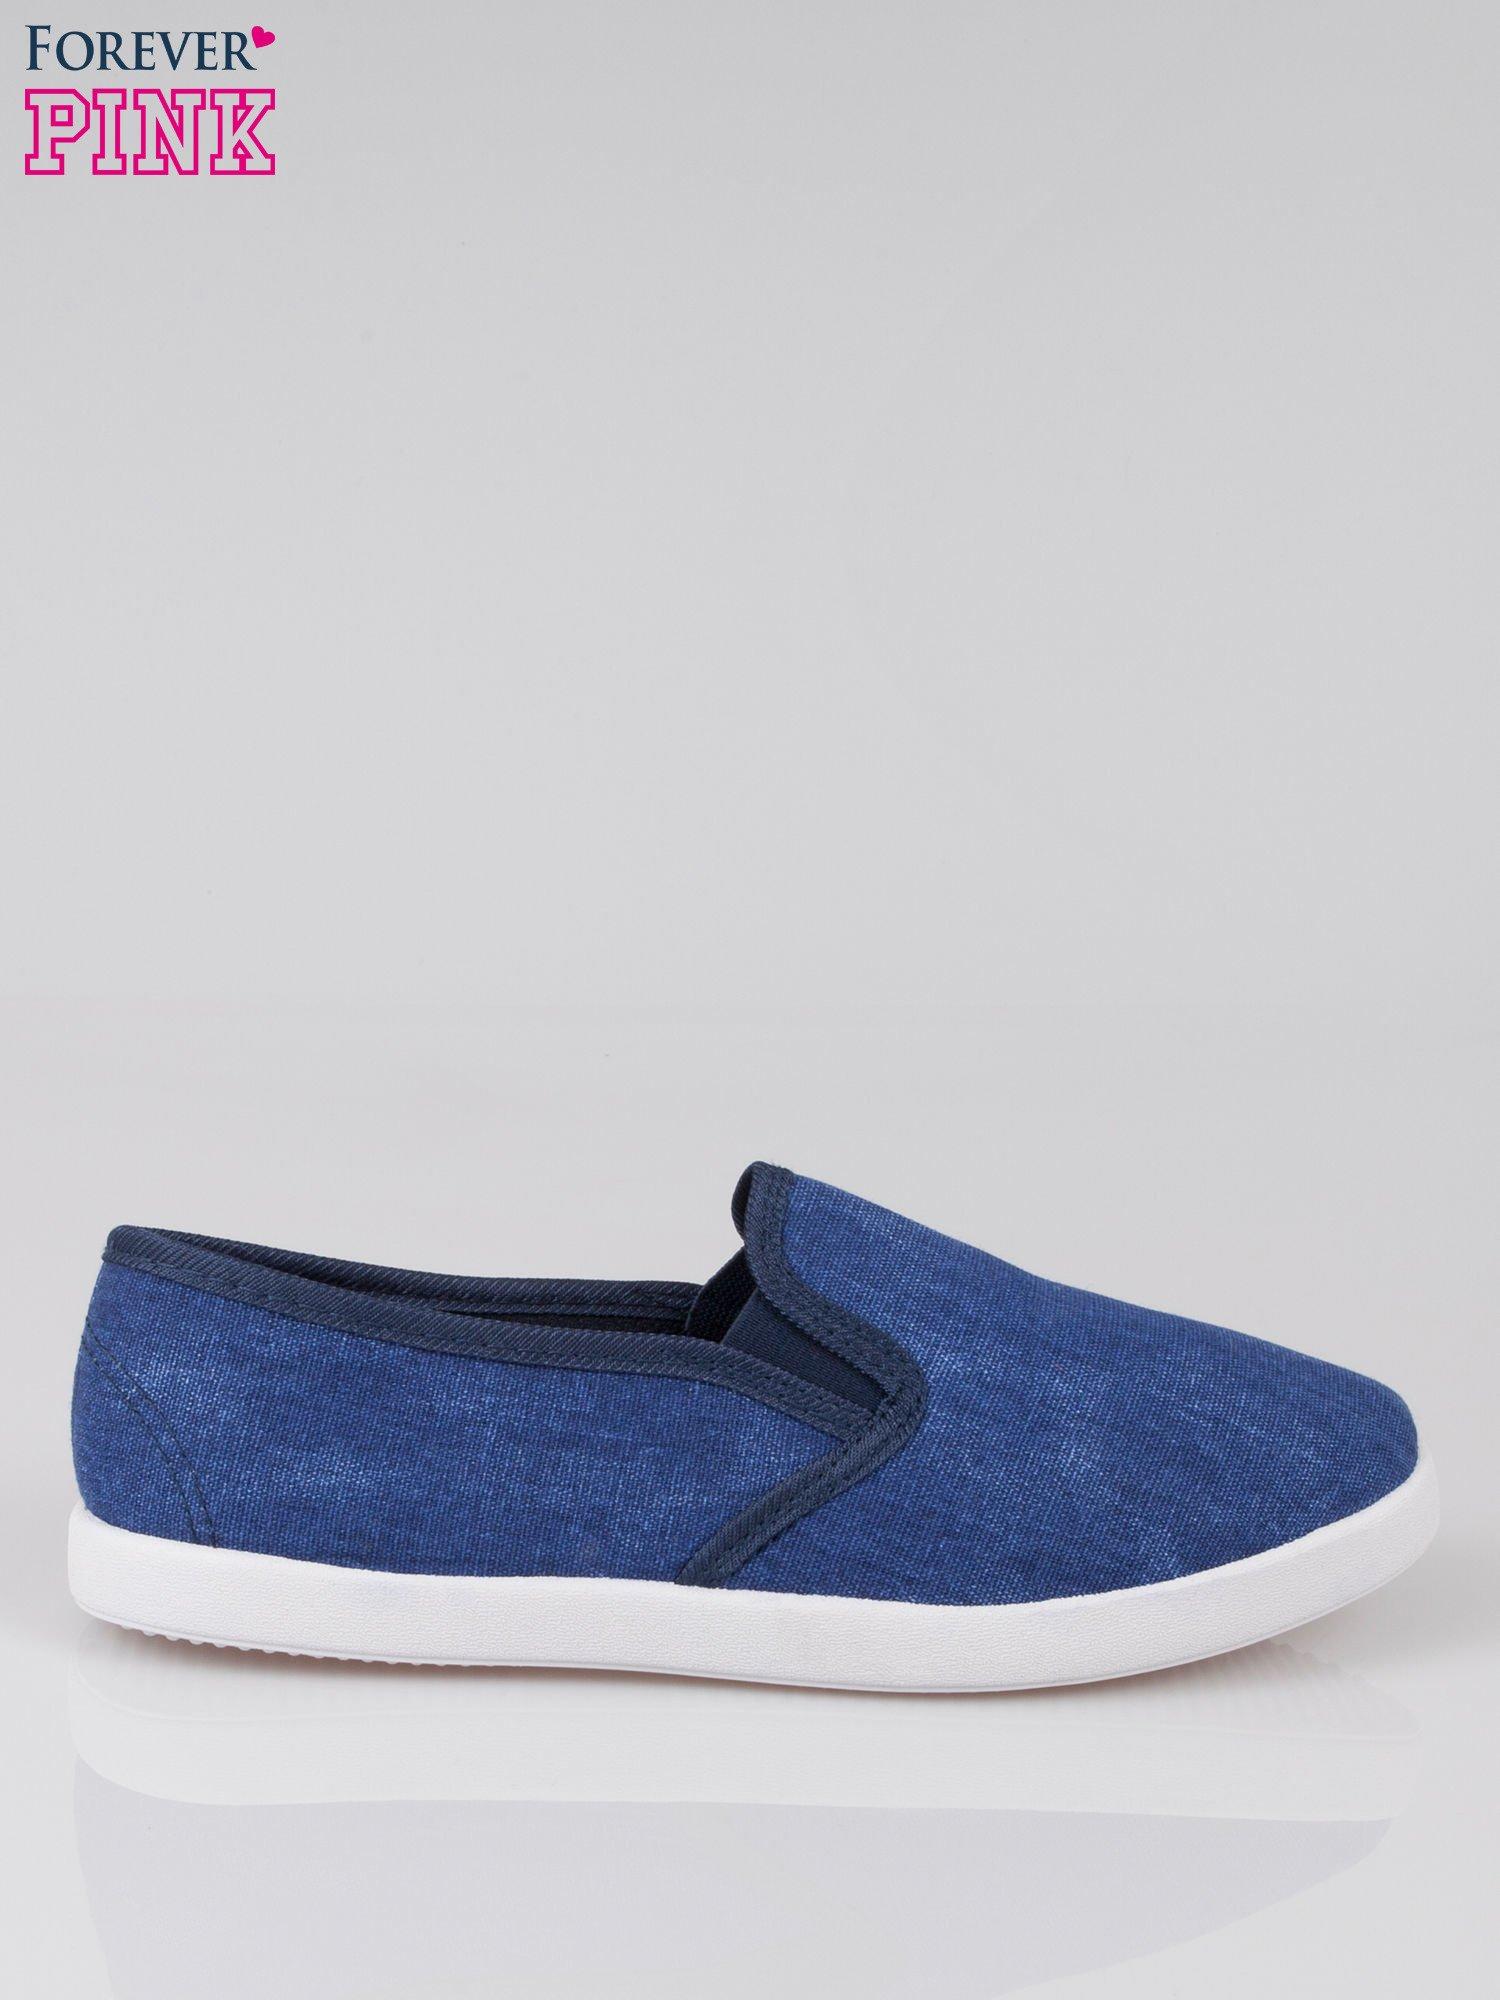 Granatowe jeansowe buty slip on                                  zdj.                                  1